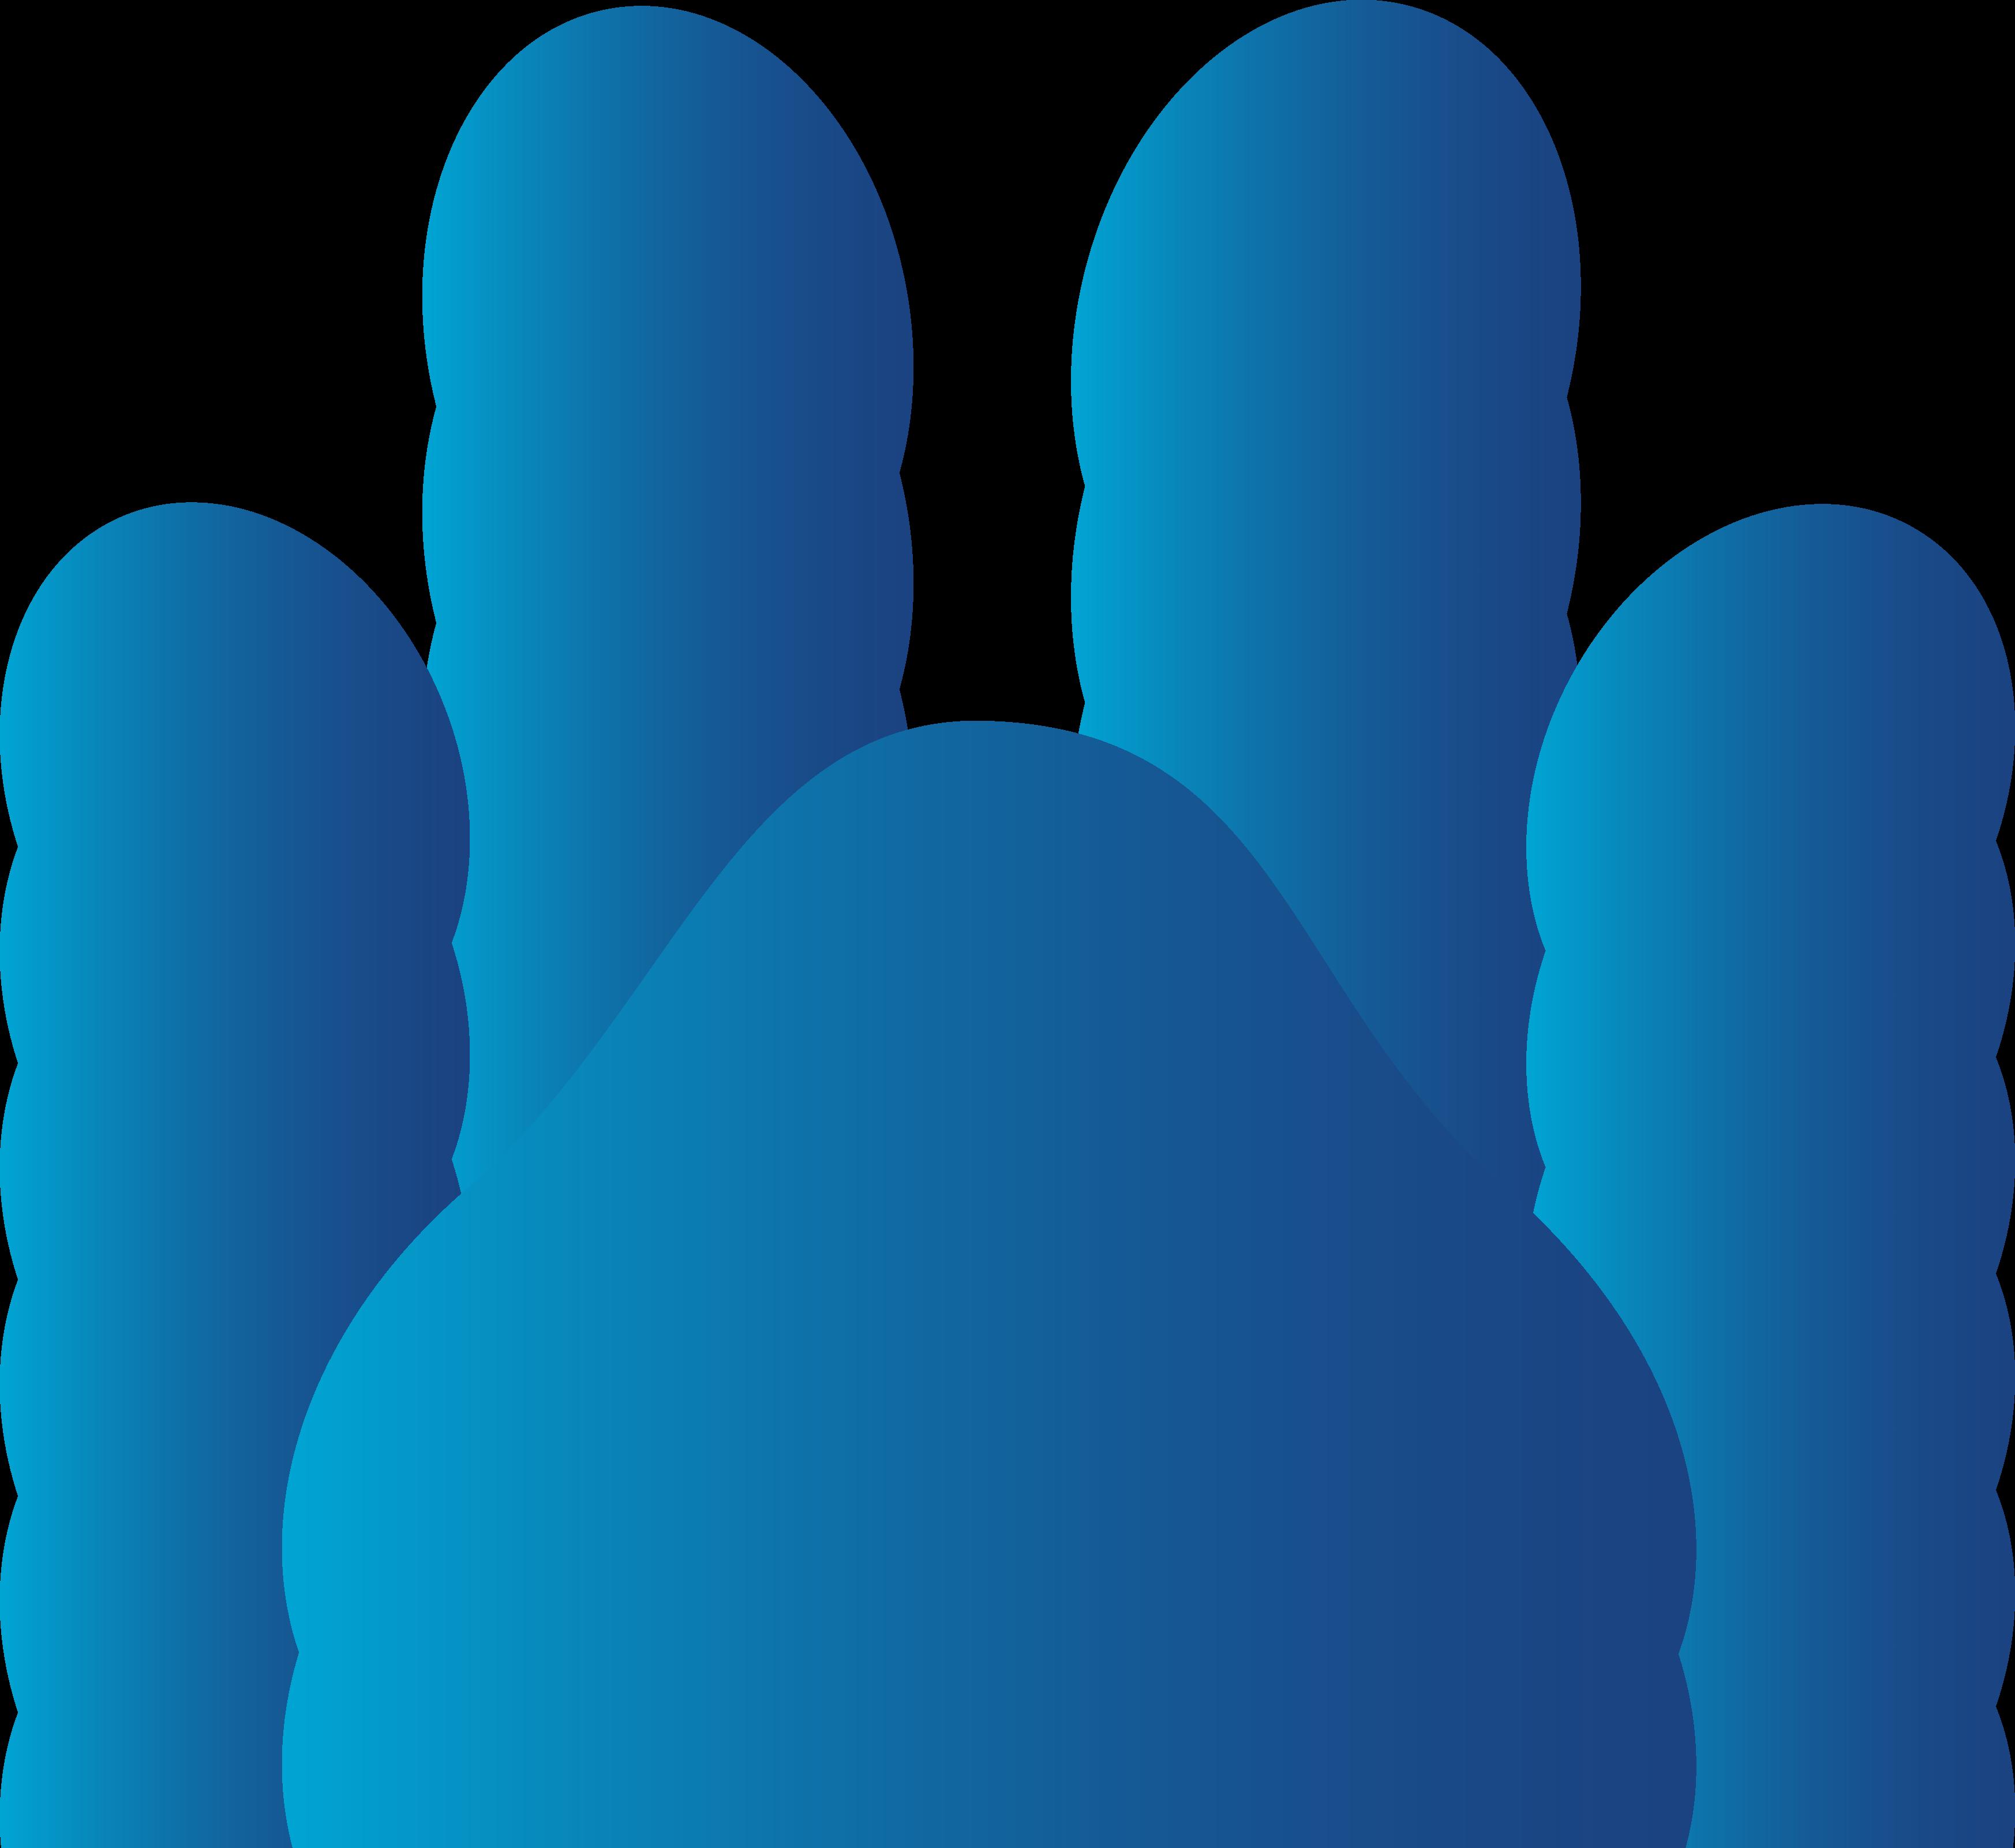 Pawprint clipart cat. Blue dog paw print